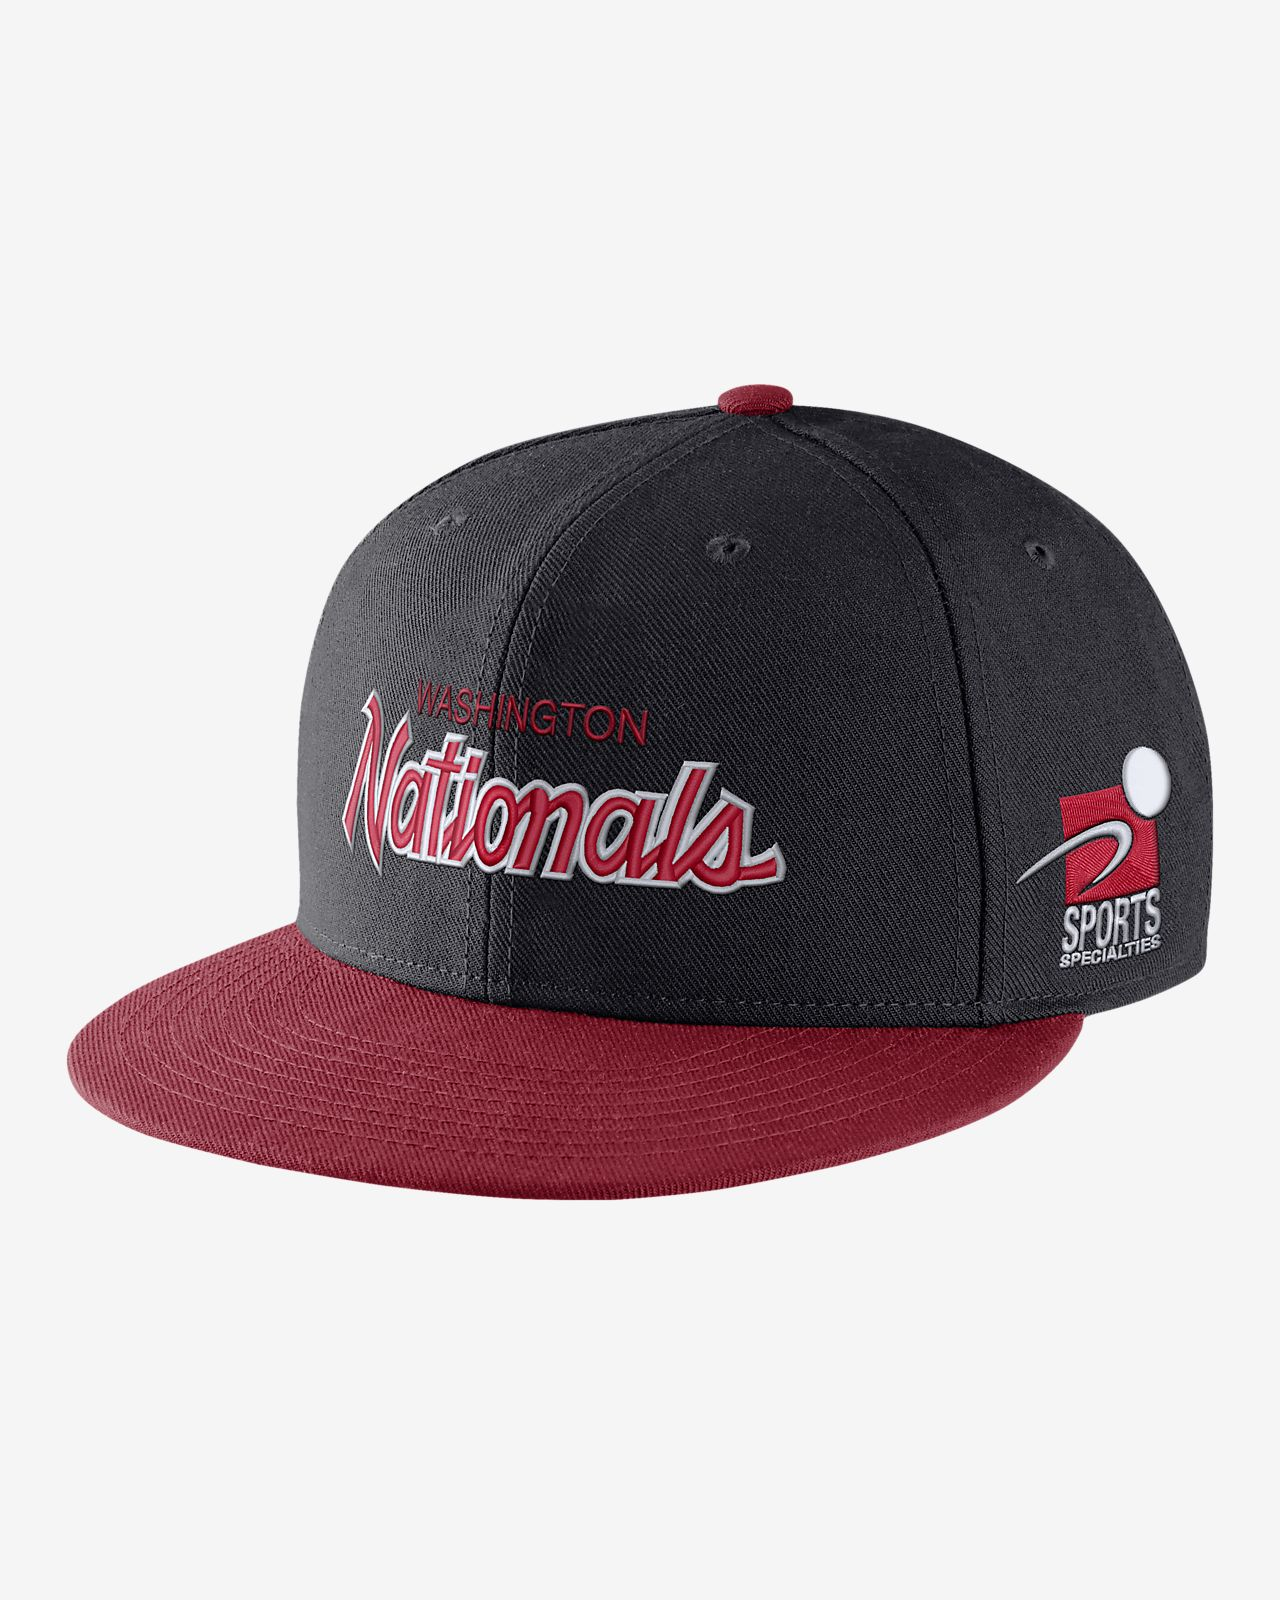 Nike Pro Sport Specialties (MLB Nationals) Adjustable Hat